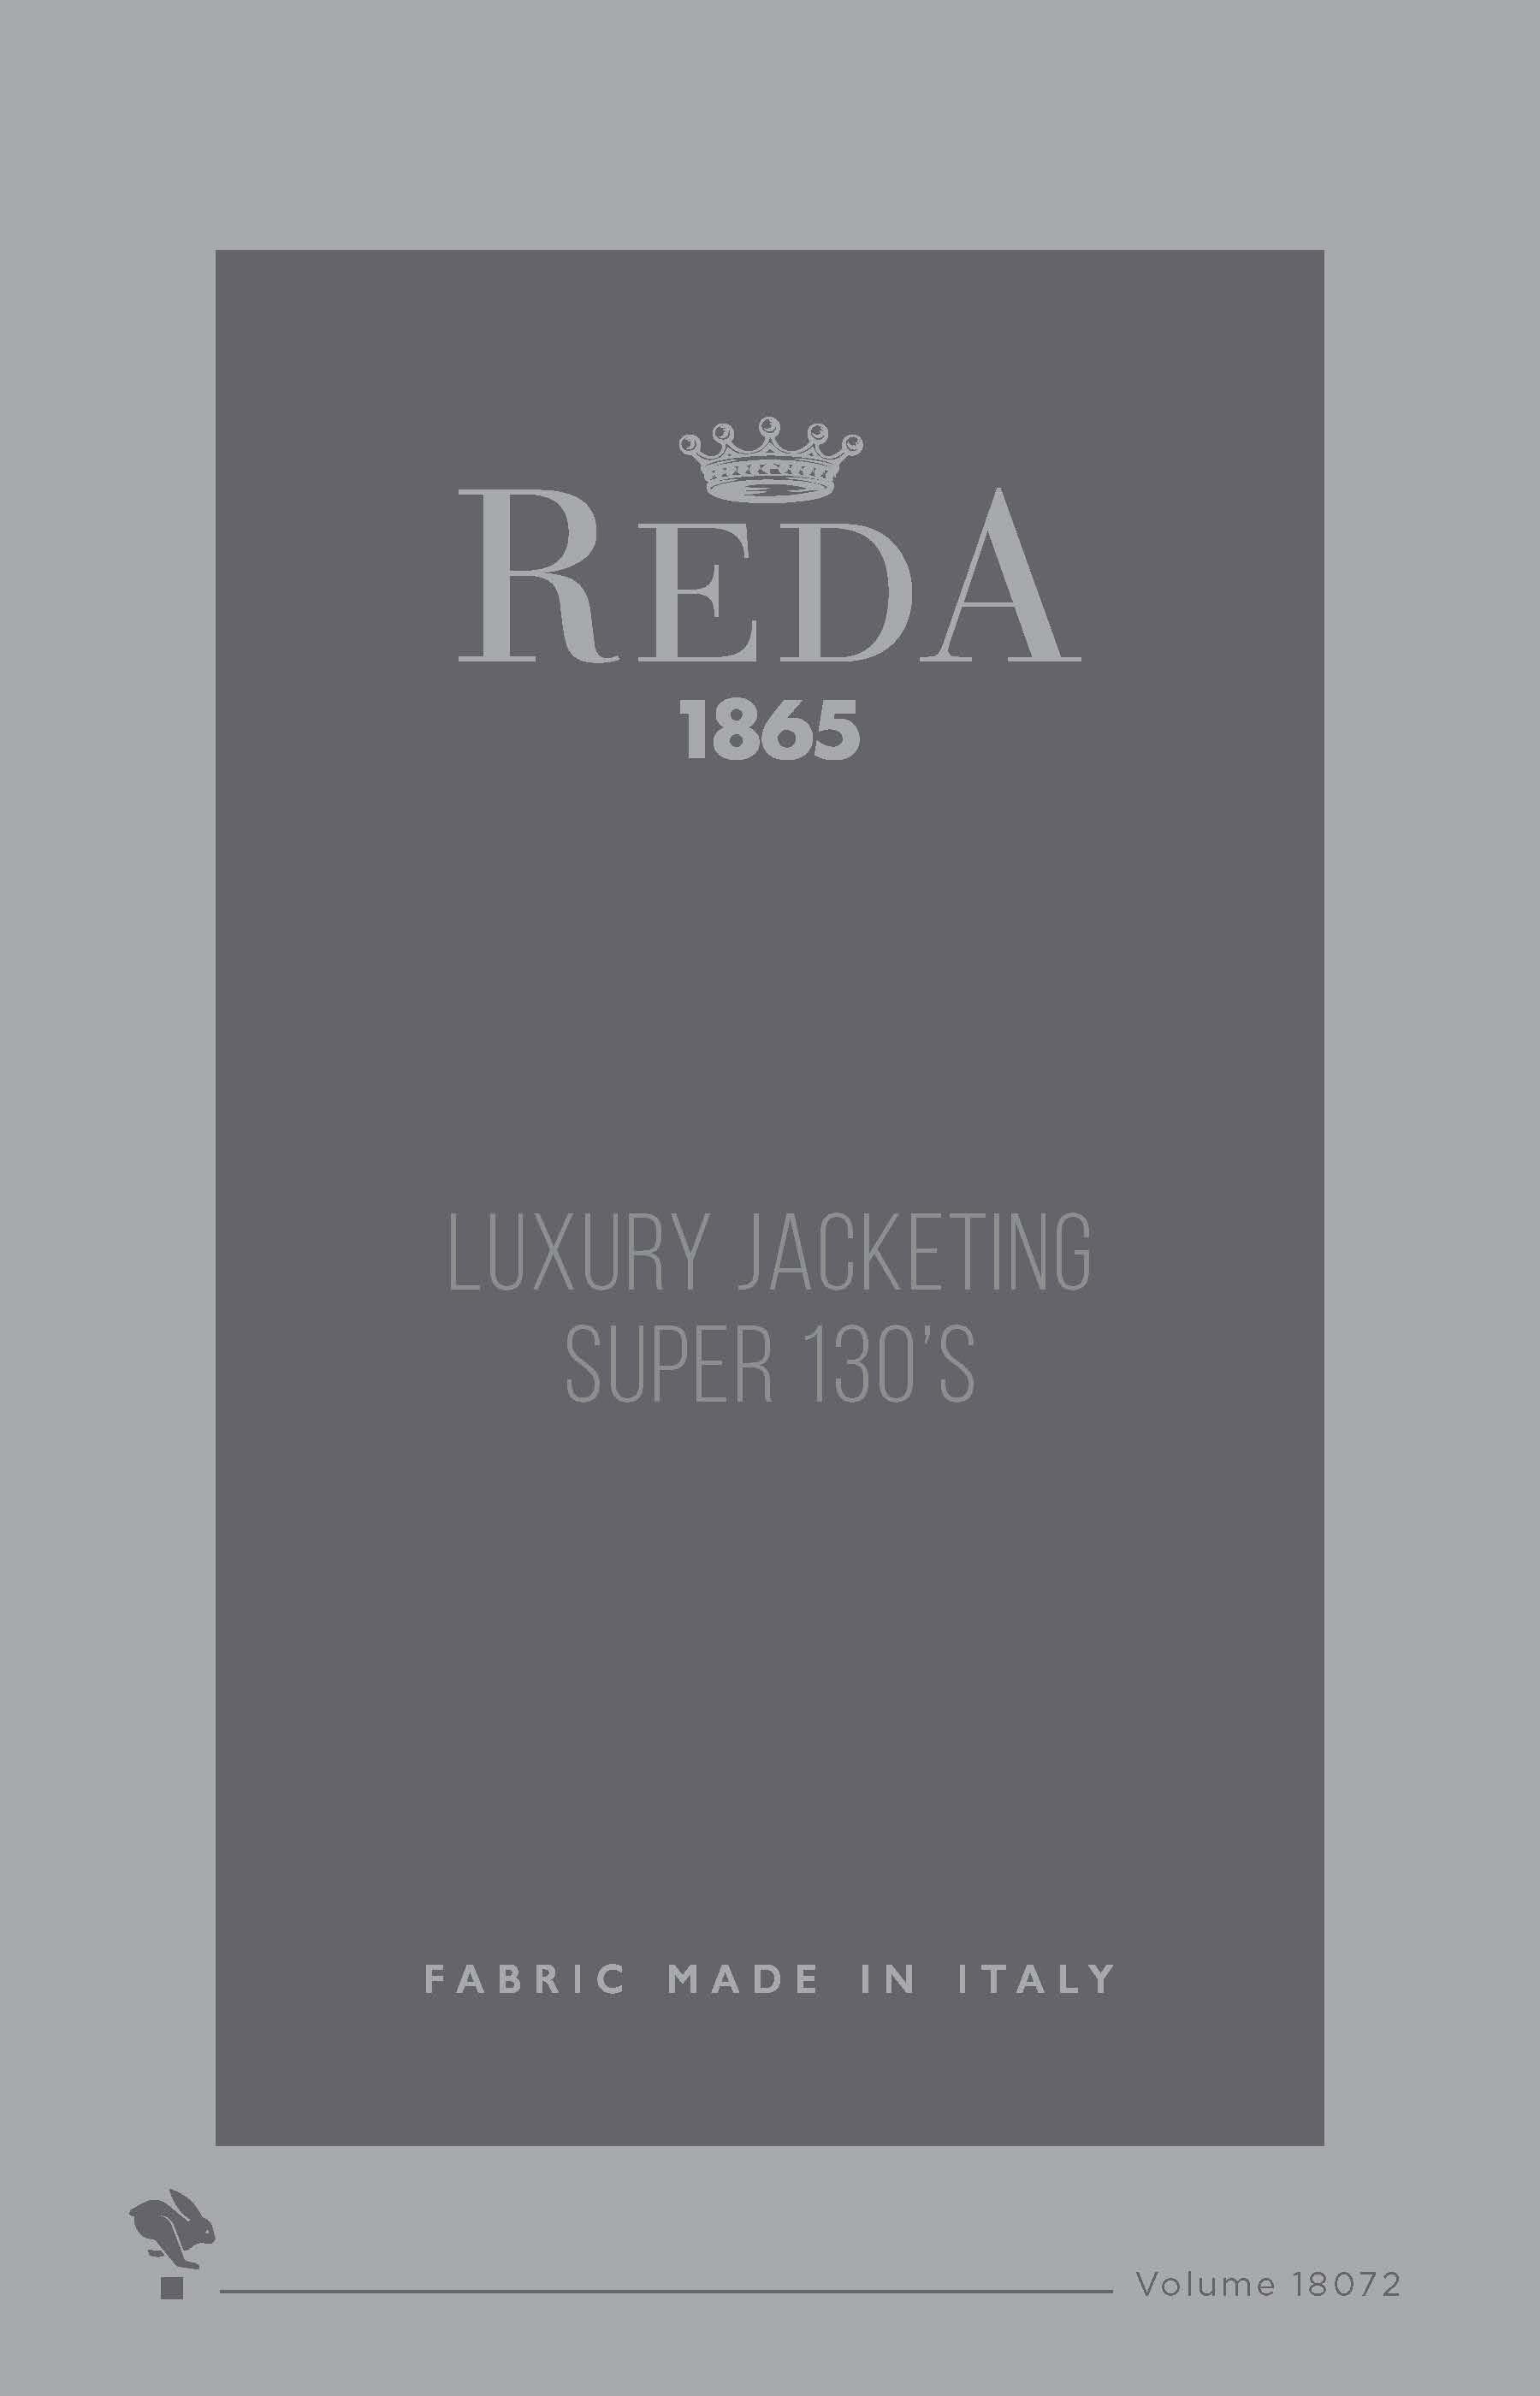 Reda_Luxury_Jacketing_Super_130s_V18072_DIGITAL.jpg